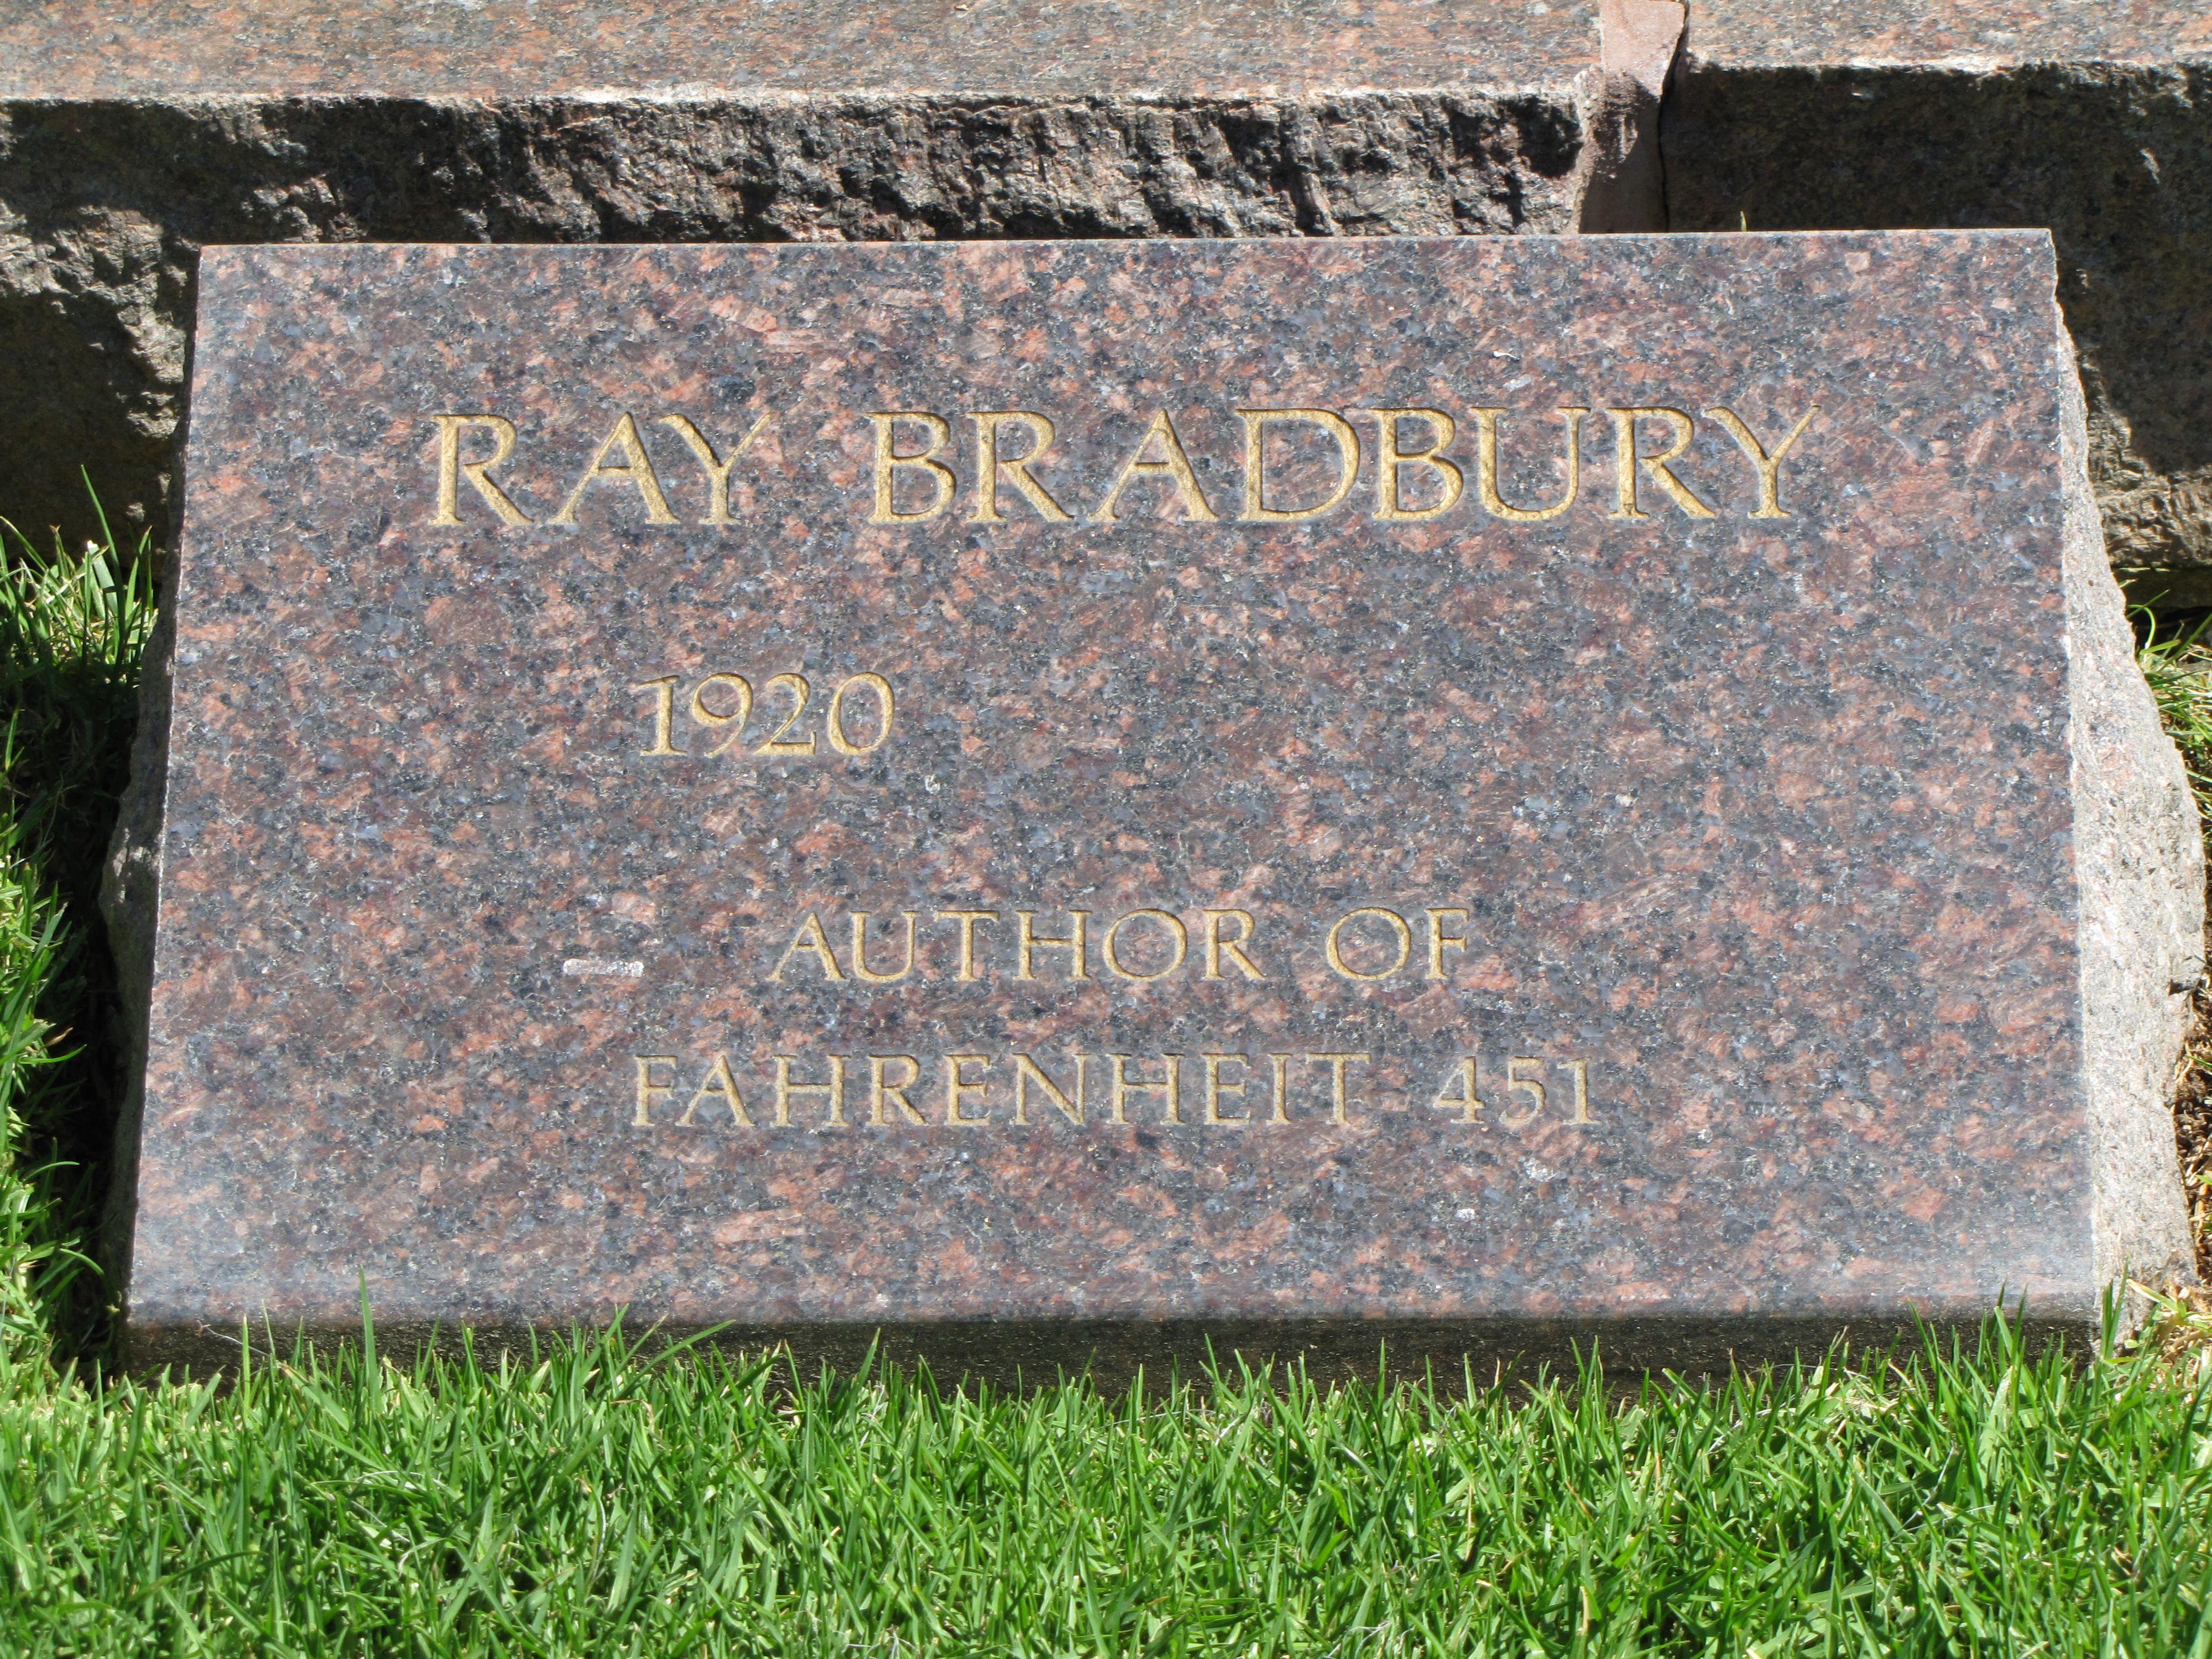 embroidery ray bradbury